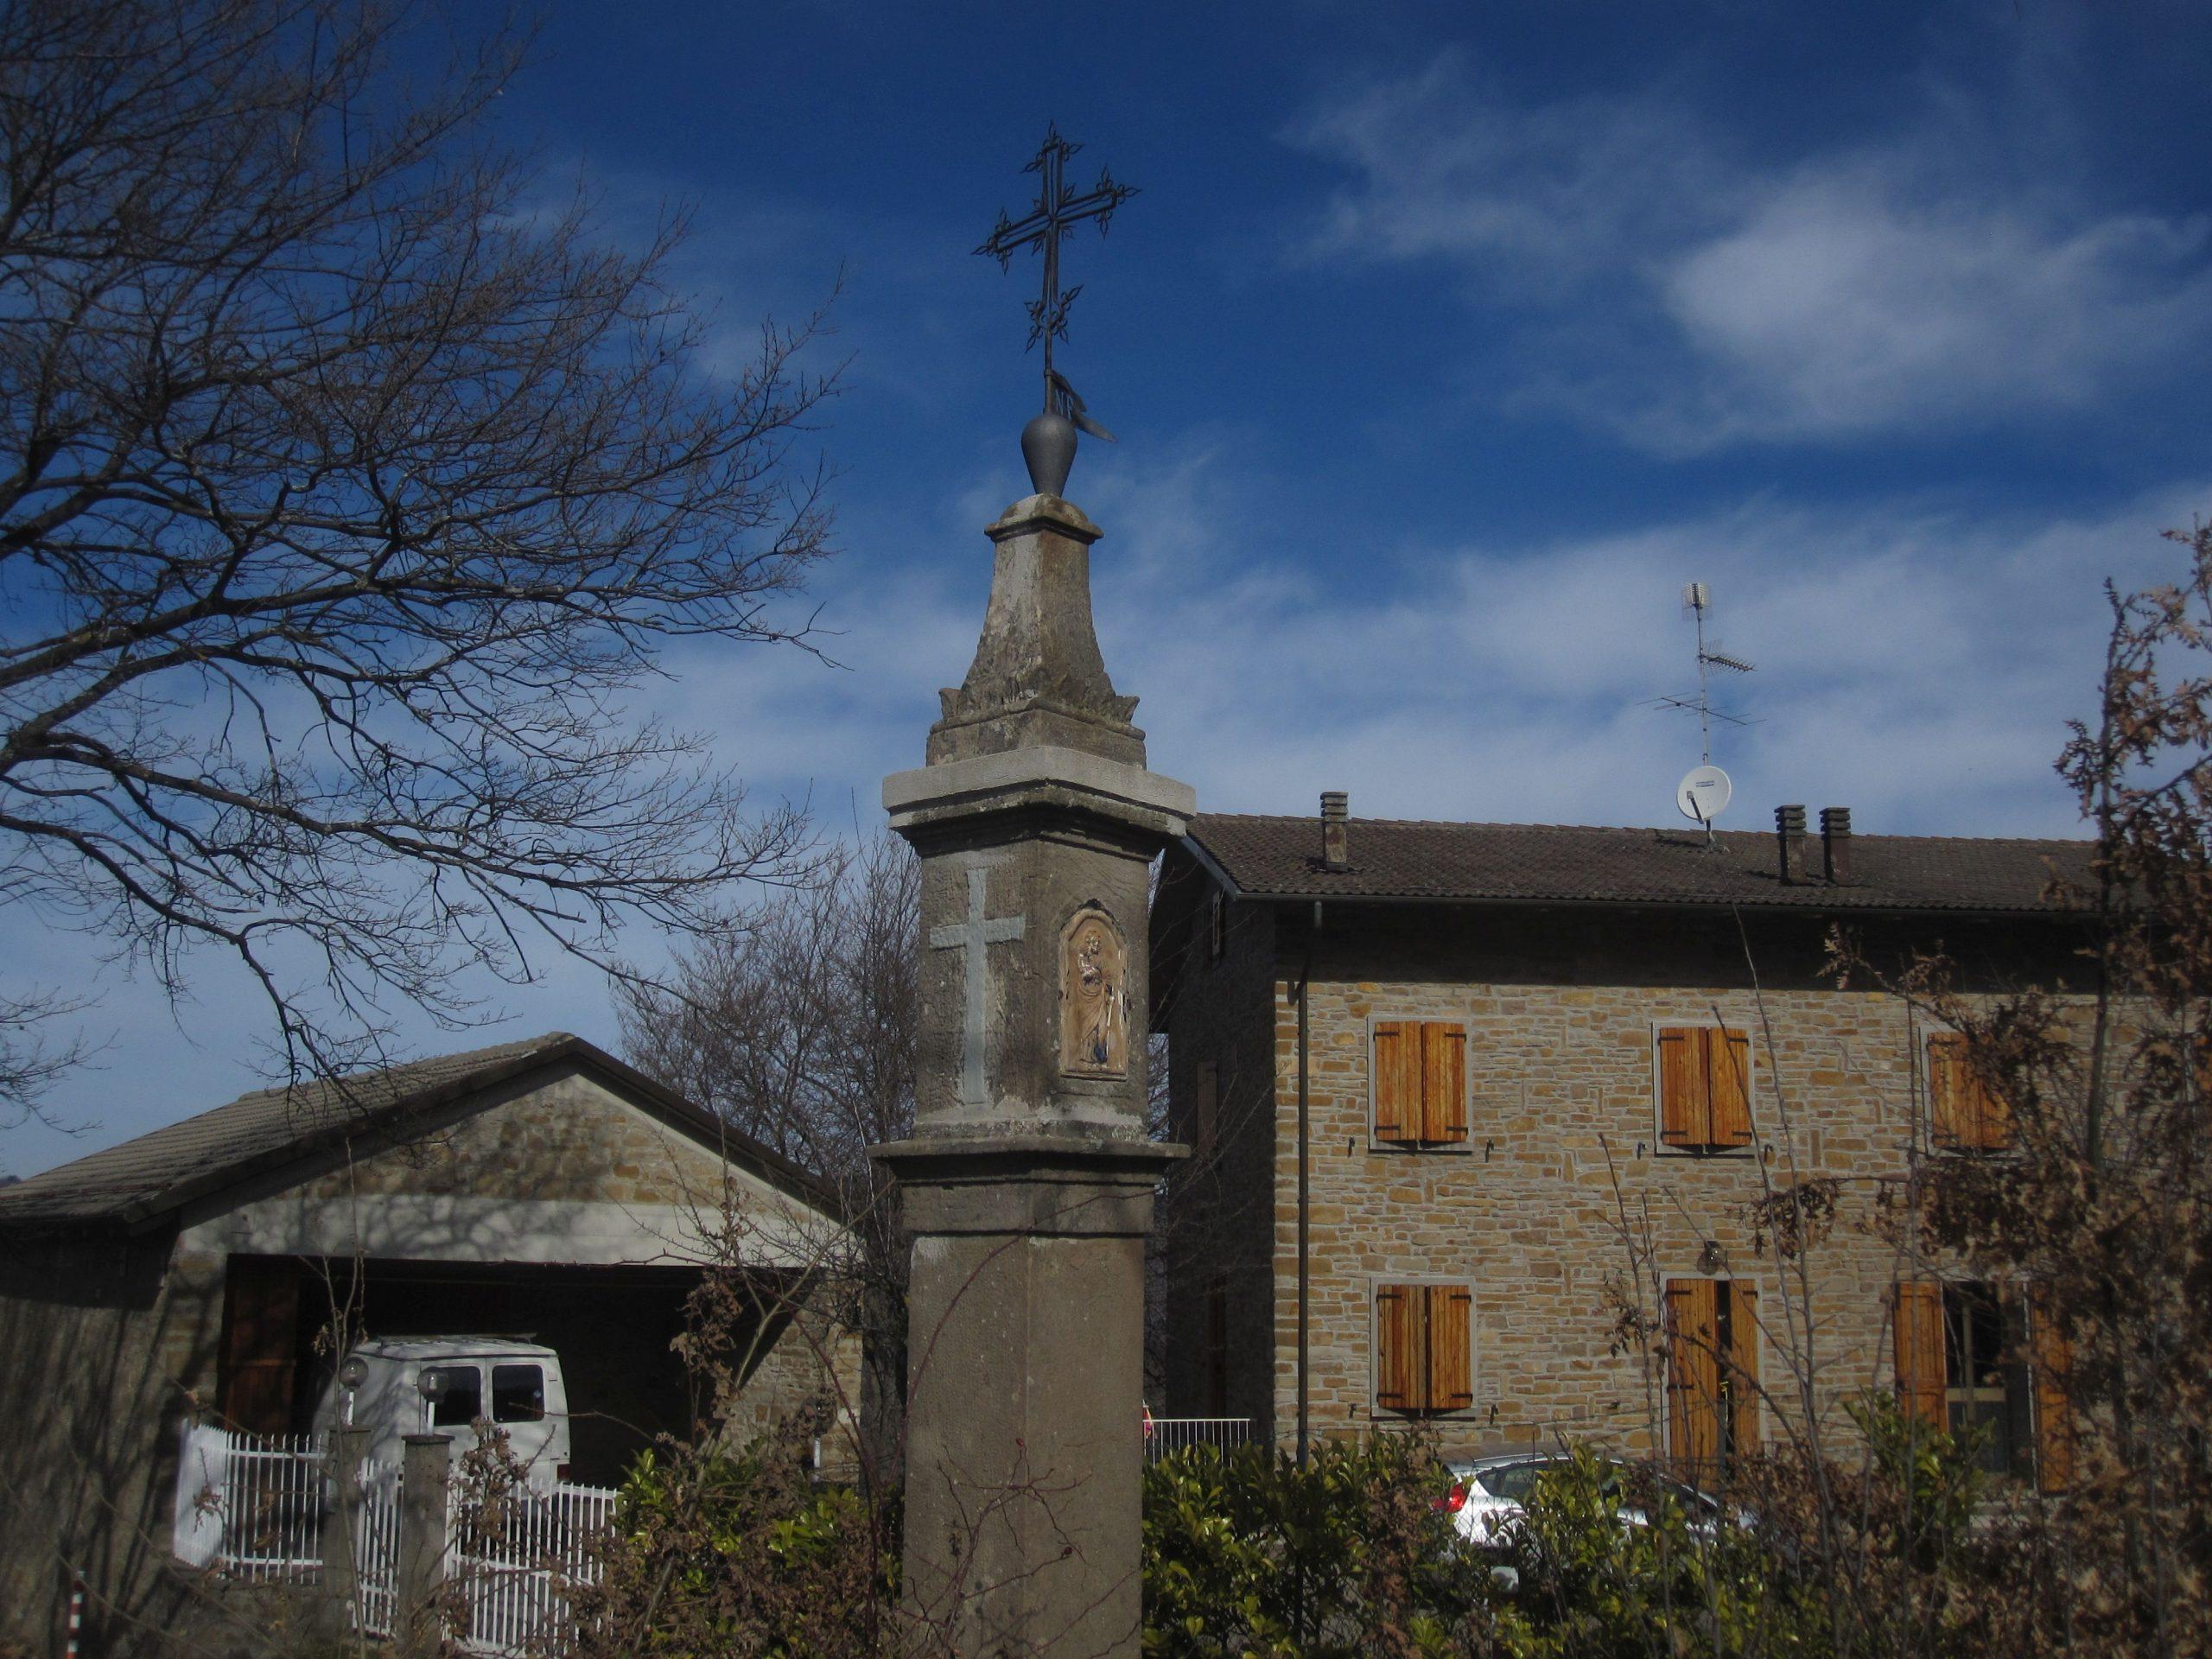 Pilastrino di Cà d'Anè a Fradusto, Monghidoro